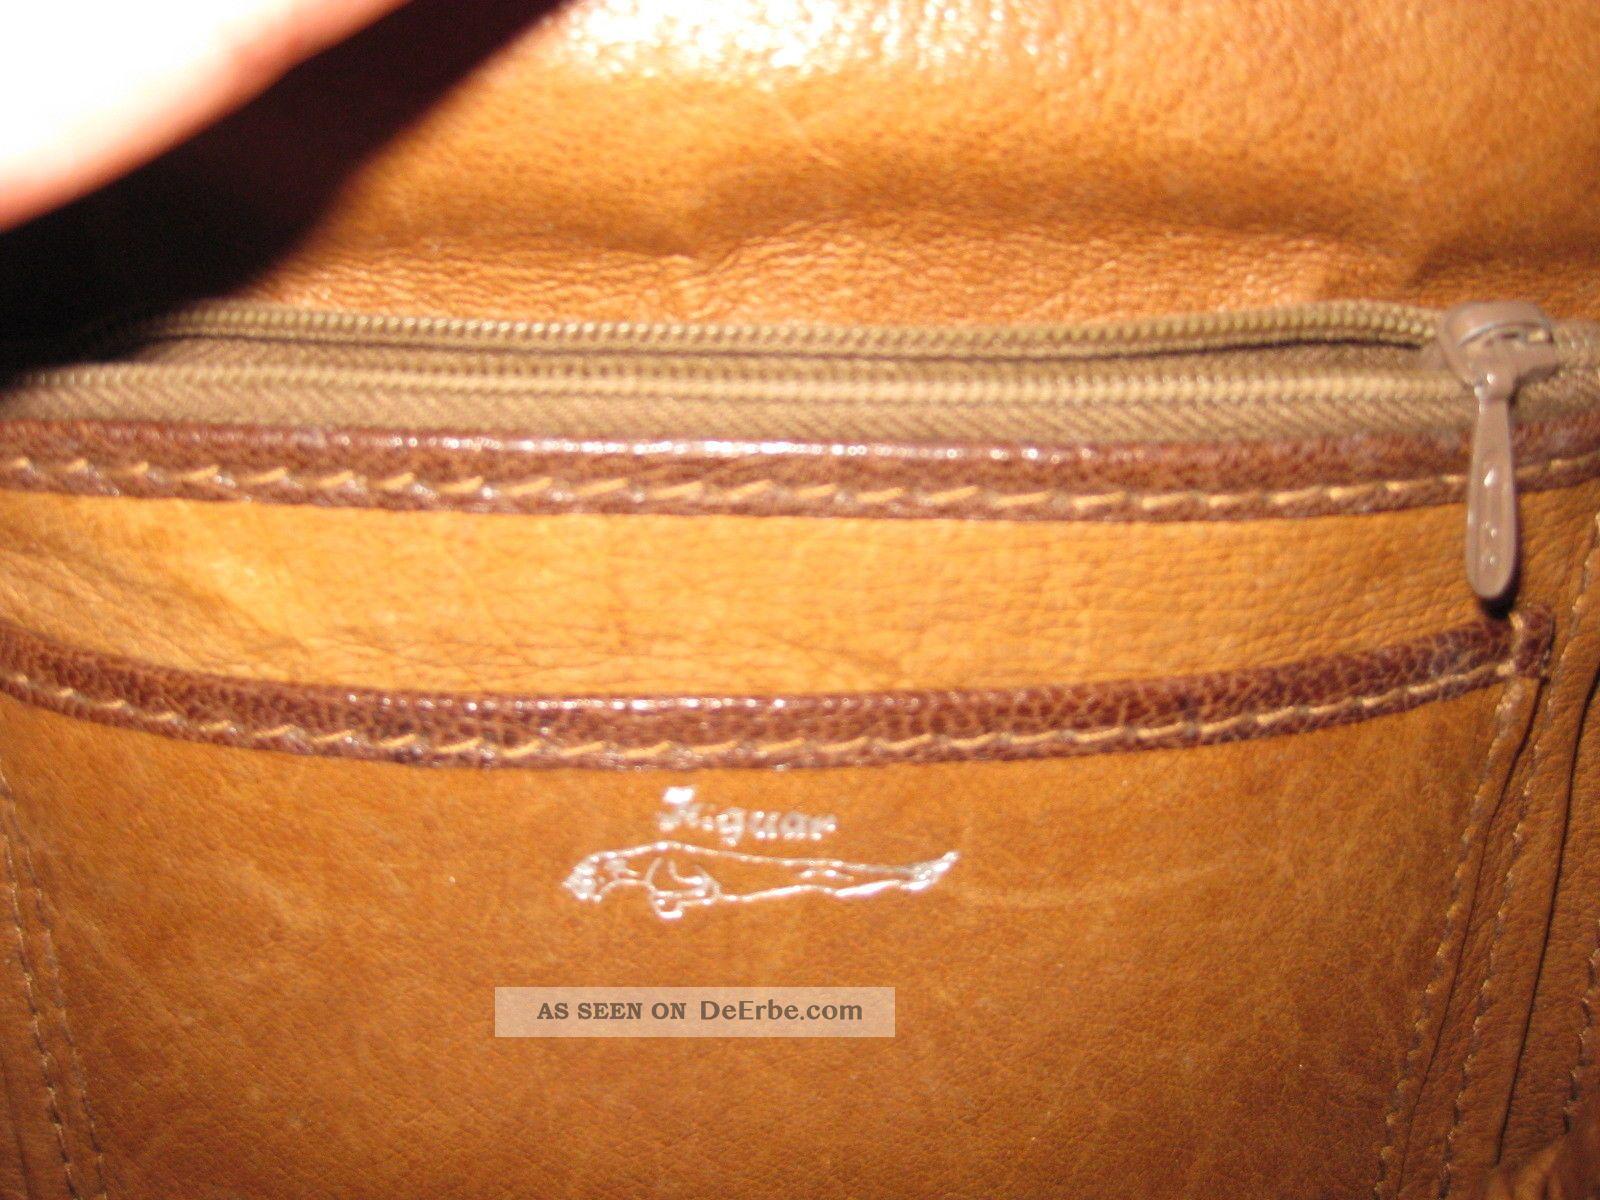 2a352c7403caa Echte Tasche Handtasche Ledertasche OrigJaguar Sehr Kroko Schöne 3c5ARSjq4L